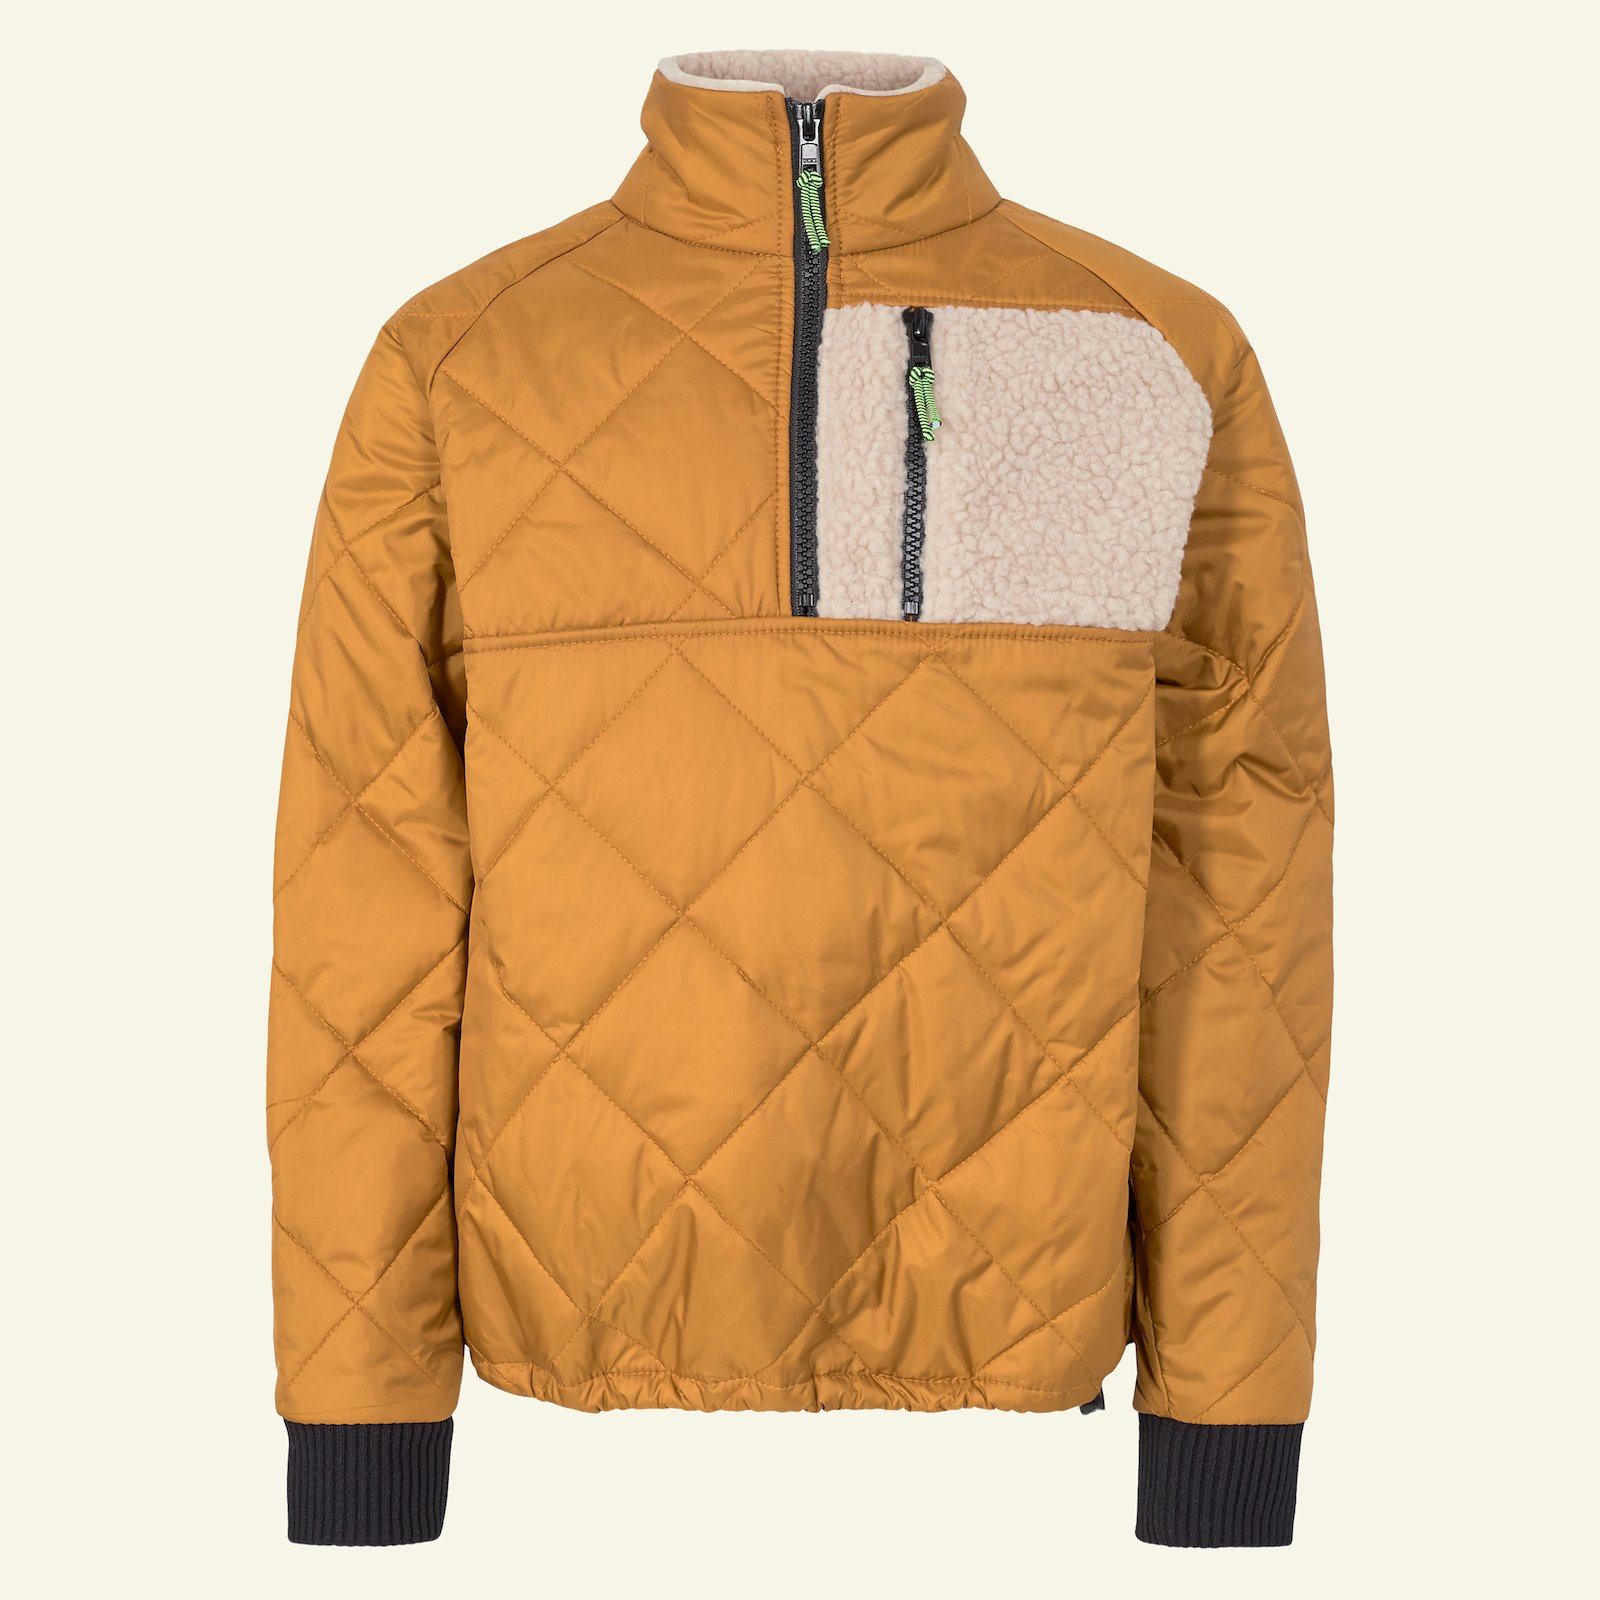 Anorak and jacket, 140/10y p64020_920218_910273_3509072_sskit